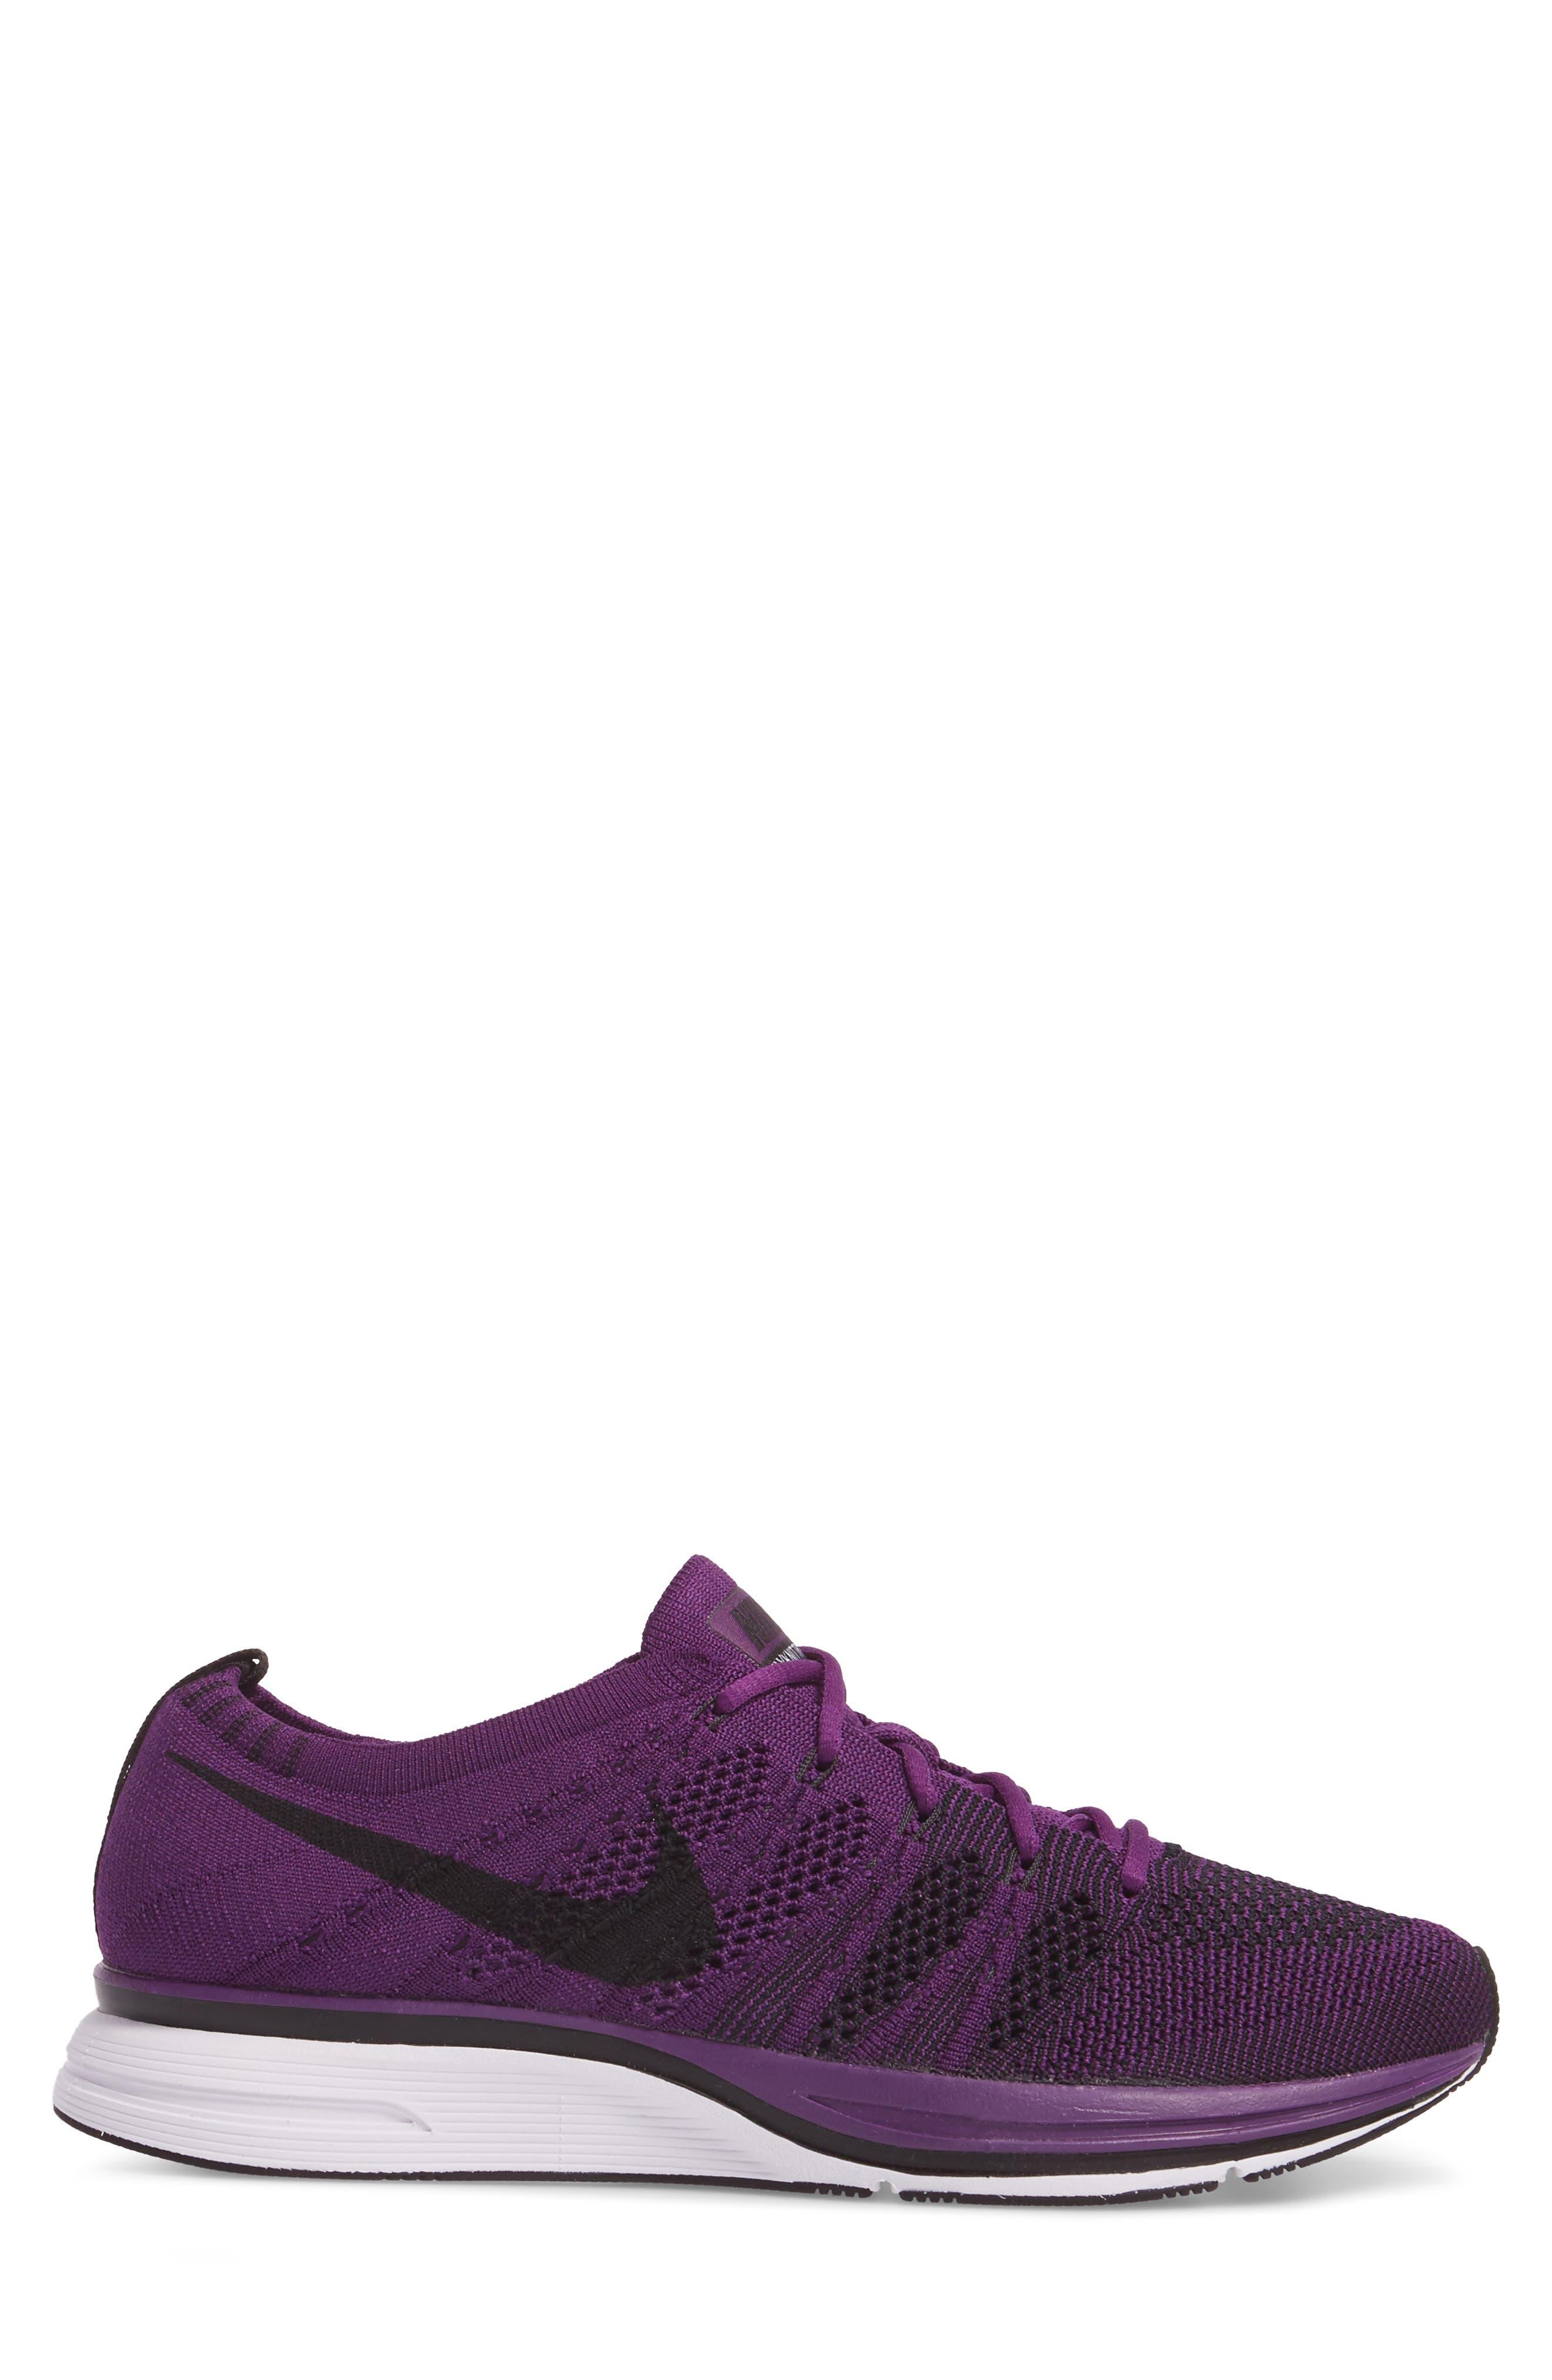 NikeLab Flyknit Trainer Sneaker,                             Alternate thumbnail 3, color,                             NIGHT PURPLE/ BLACK/ WHITE